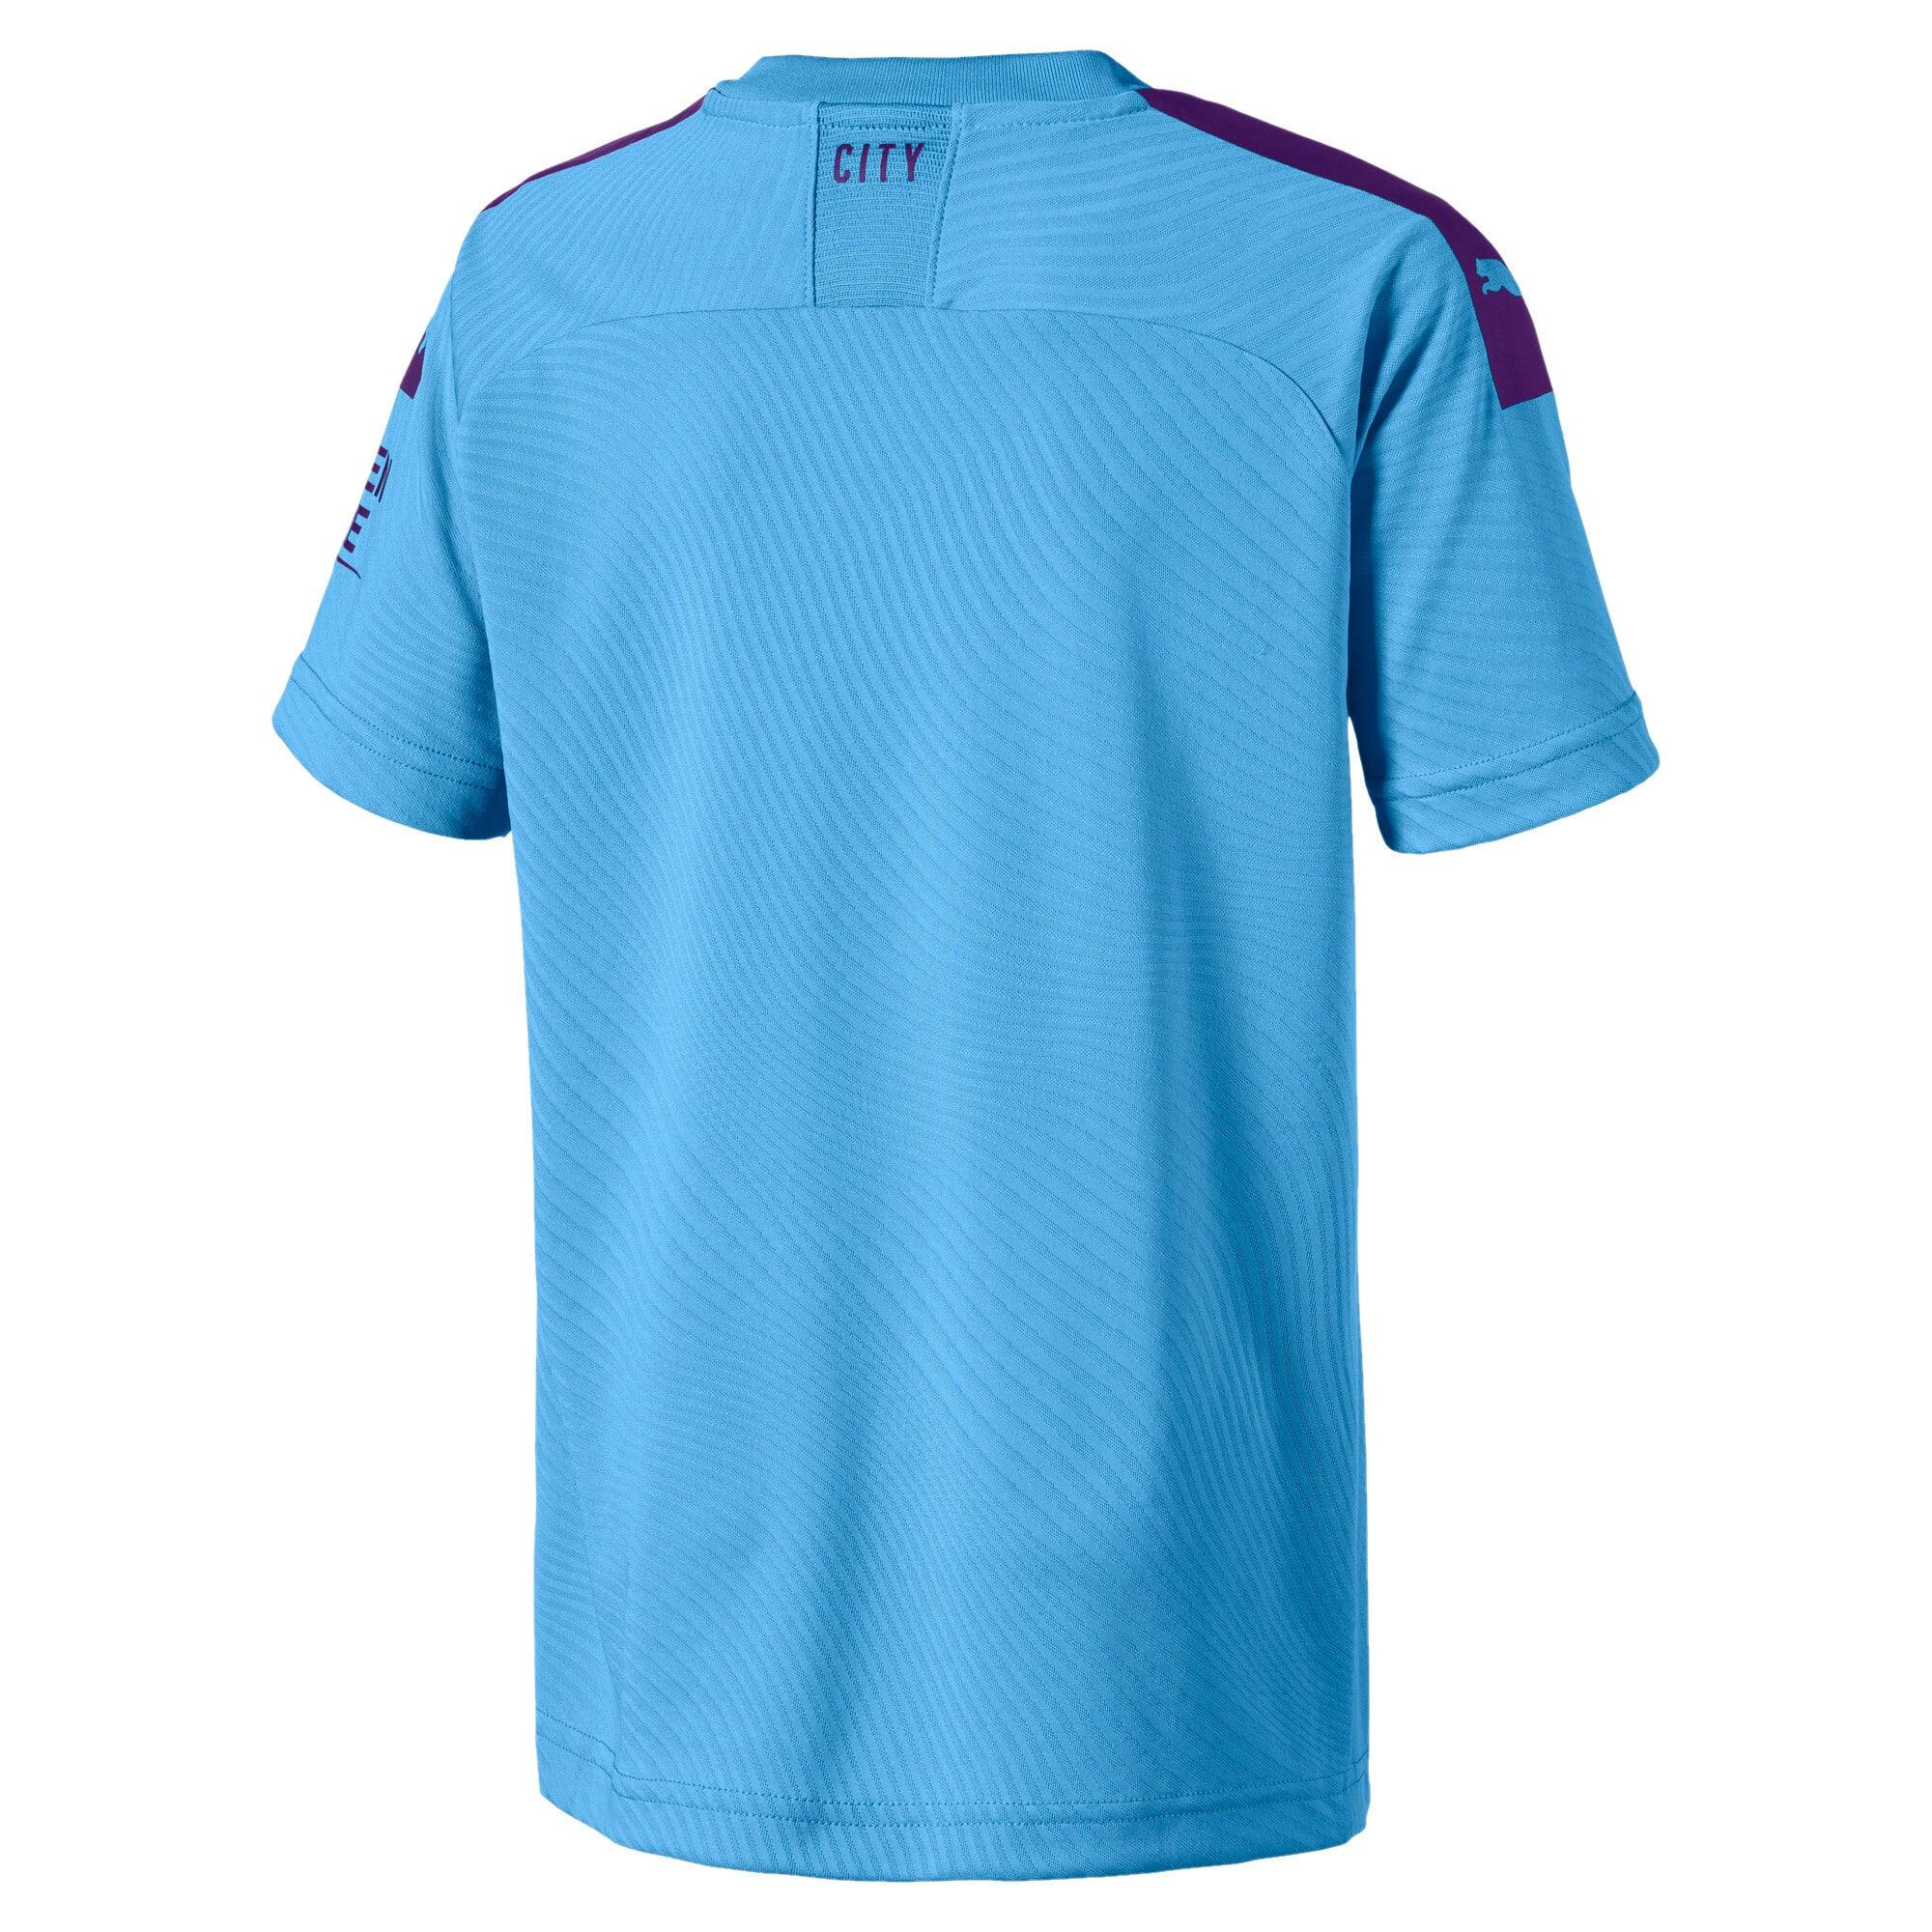 Miniatura 2 de Réplica de camiseta de local Manchester City FC para niños, TeamLightBlue-TillandsiaPurp, mediano